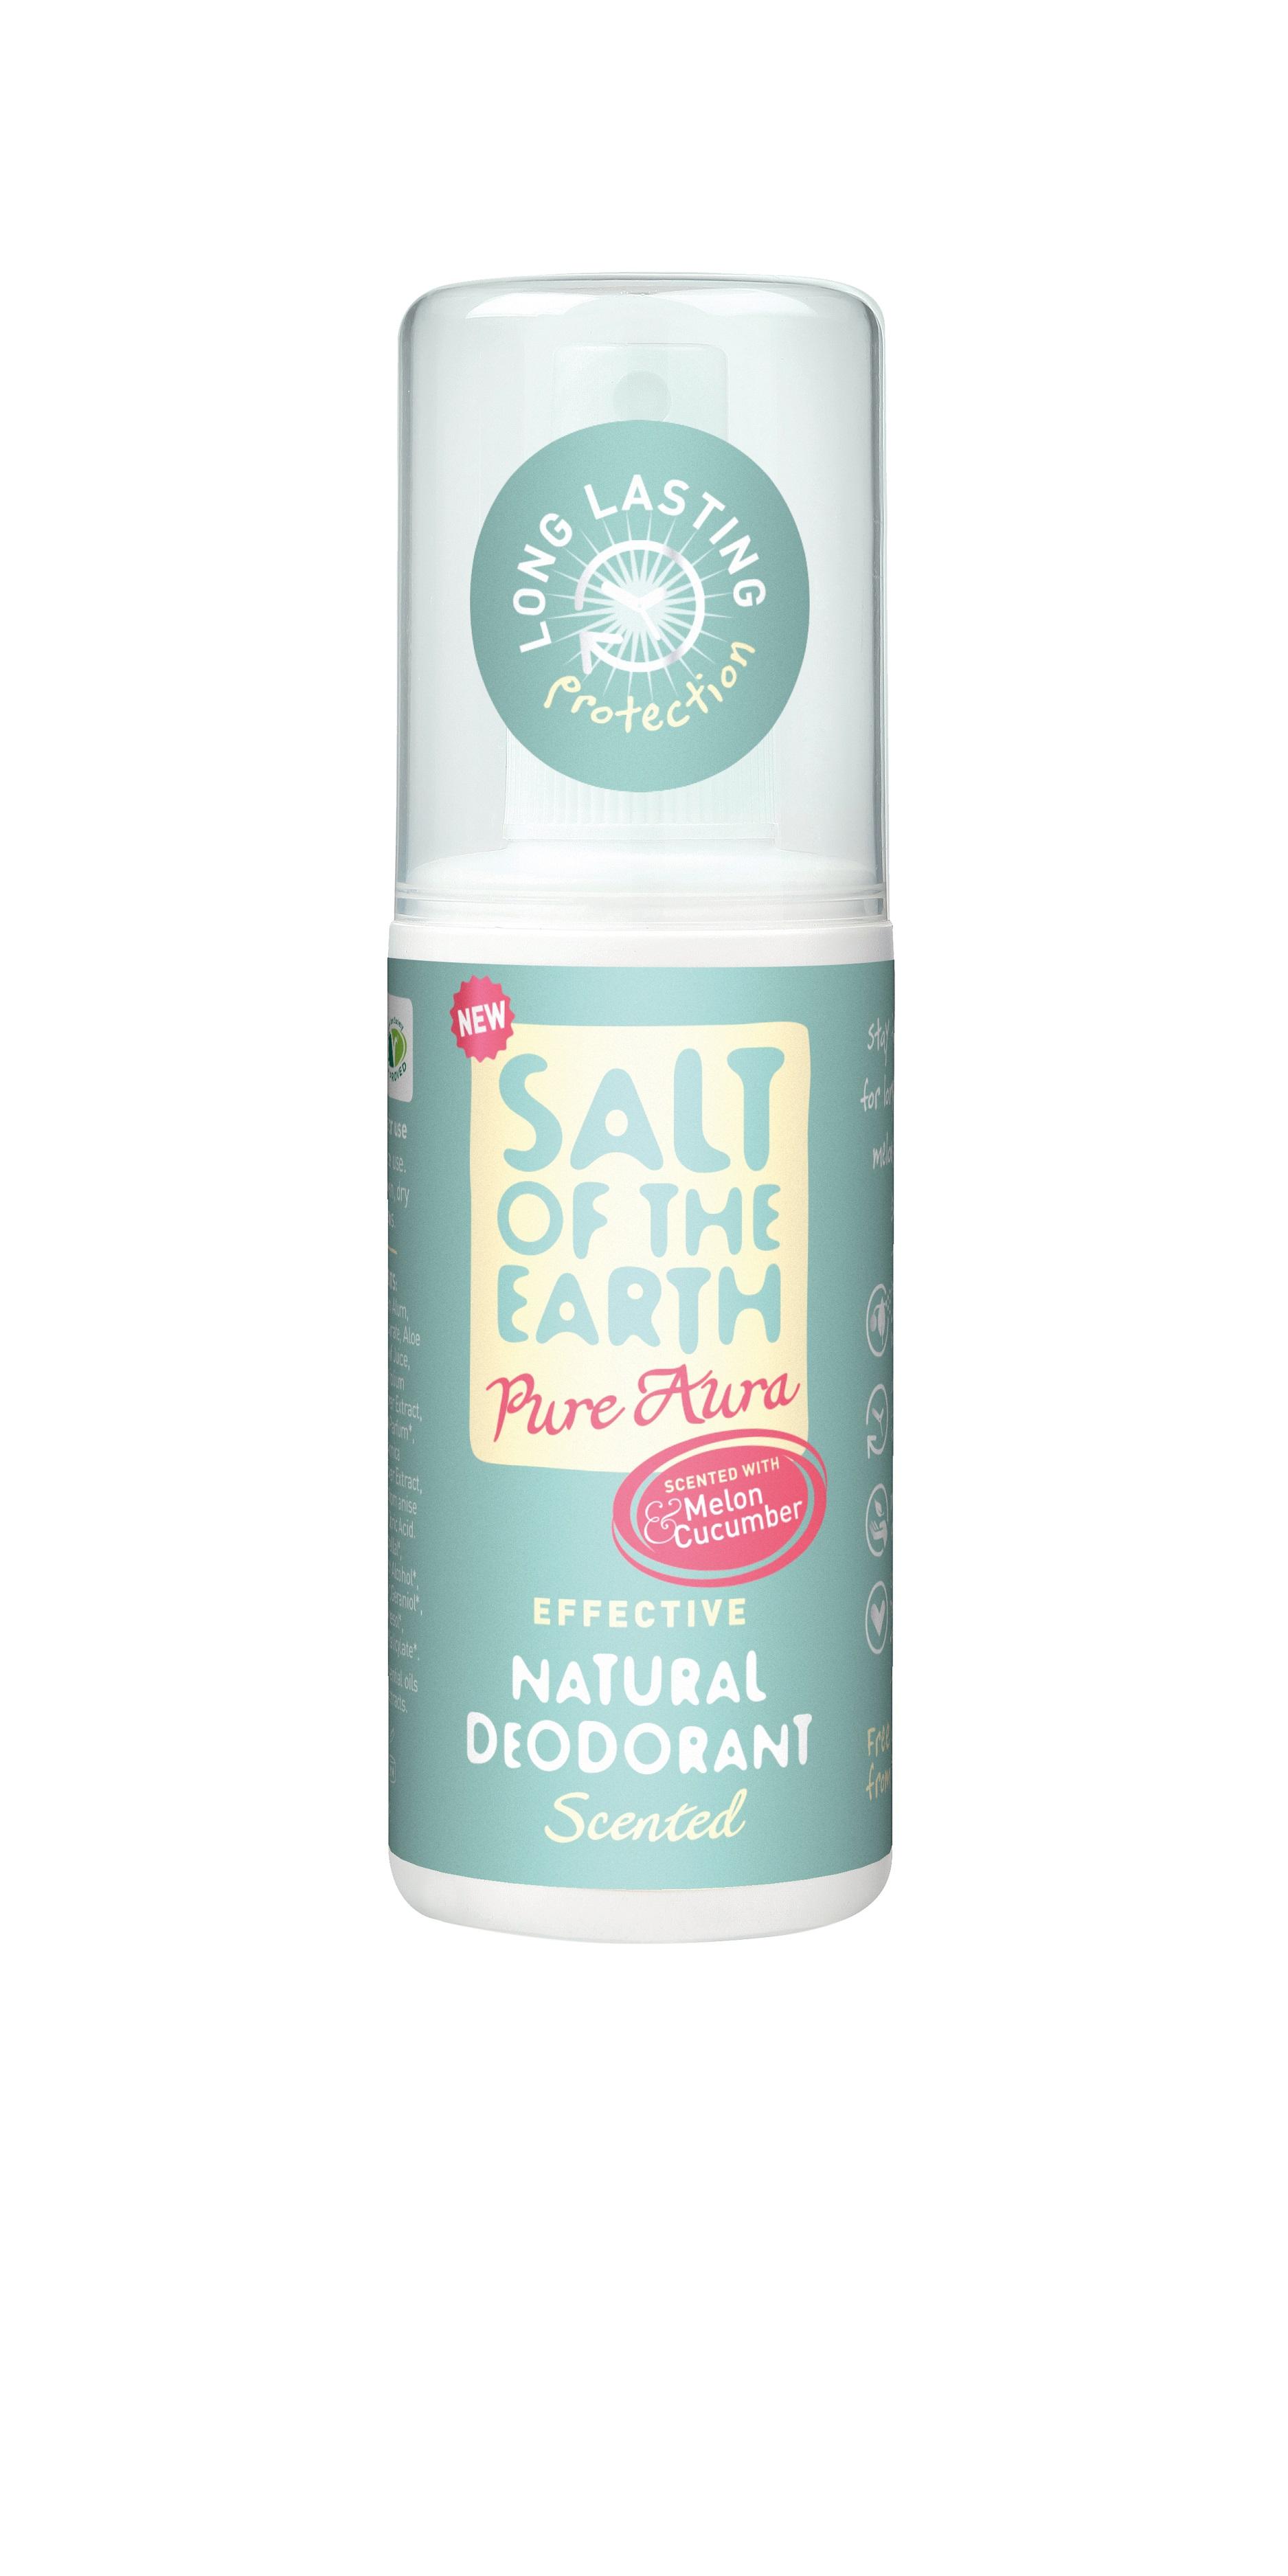 Melon and Cucumber Natural Deodorant Spray 100ml (Pure Aura)